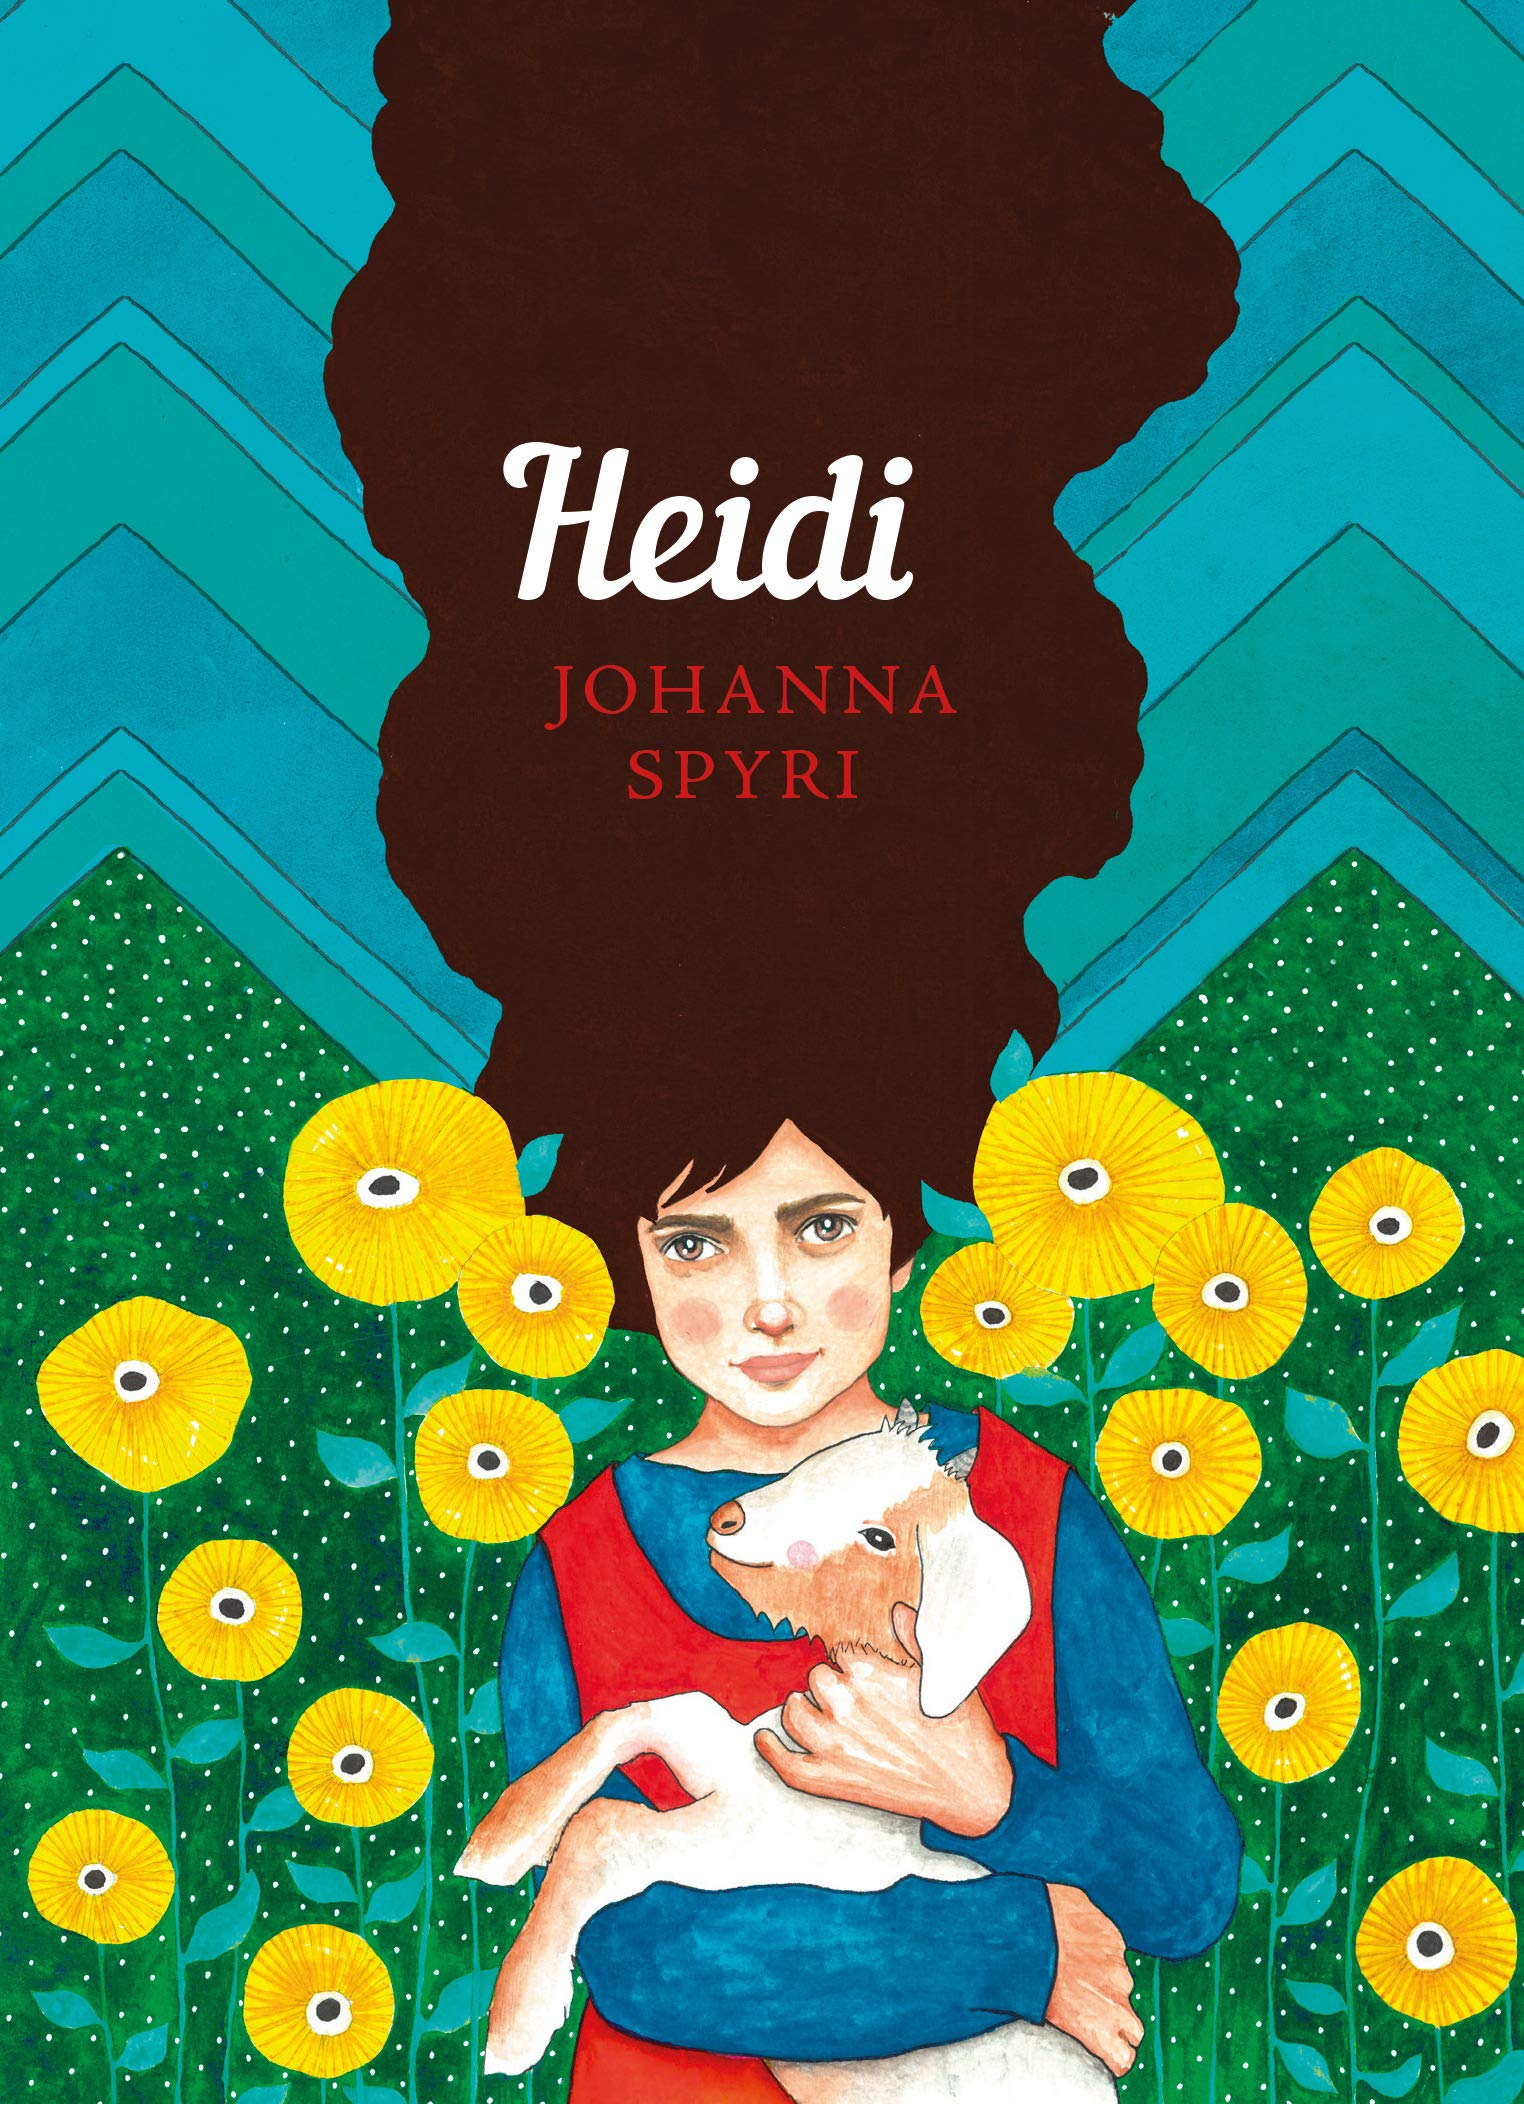 heidi johanna spyri sisterhood collection